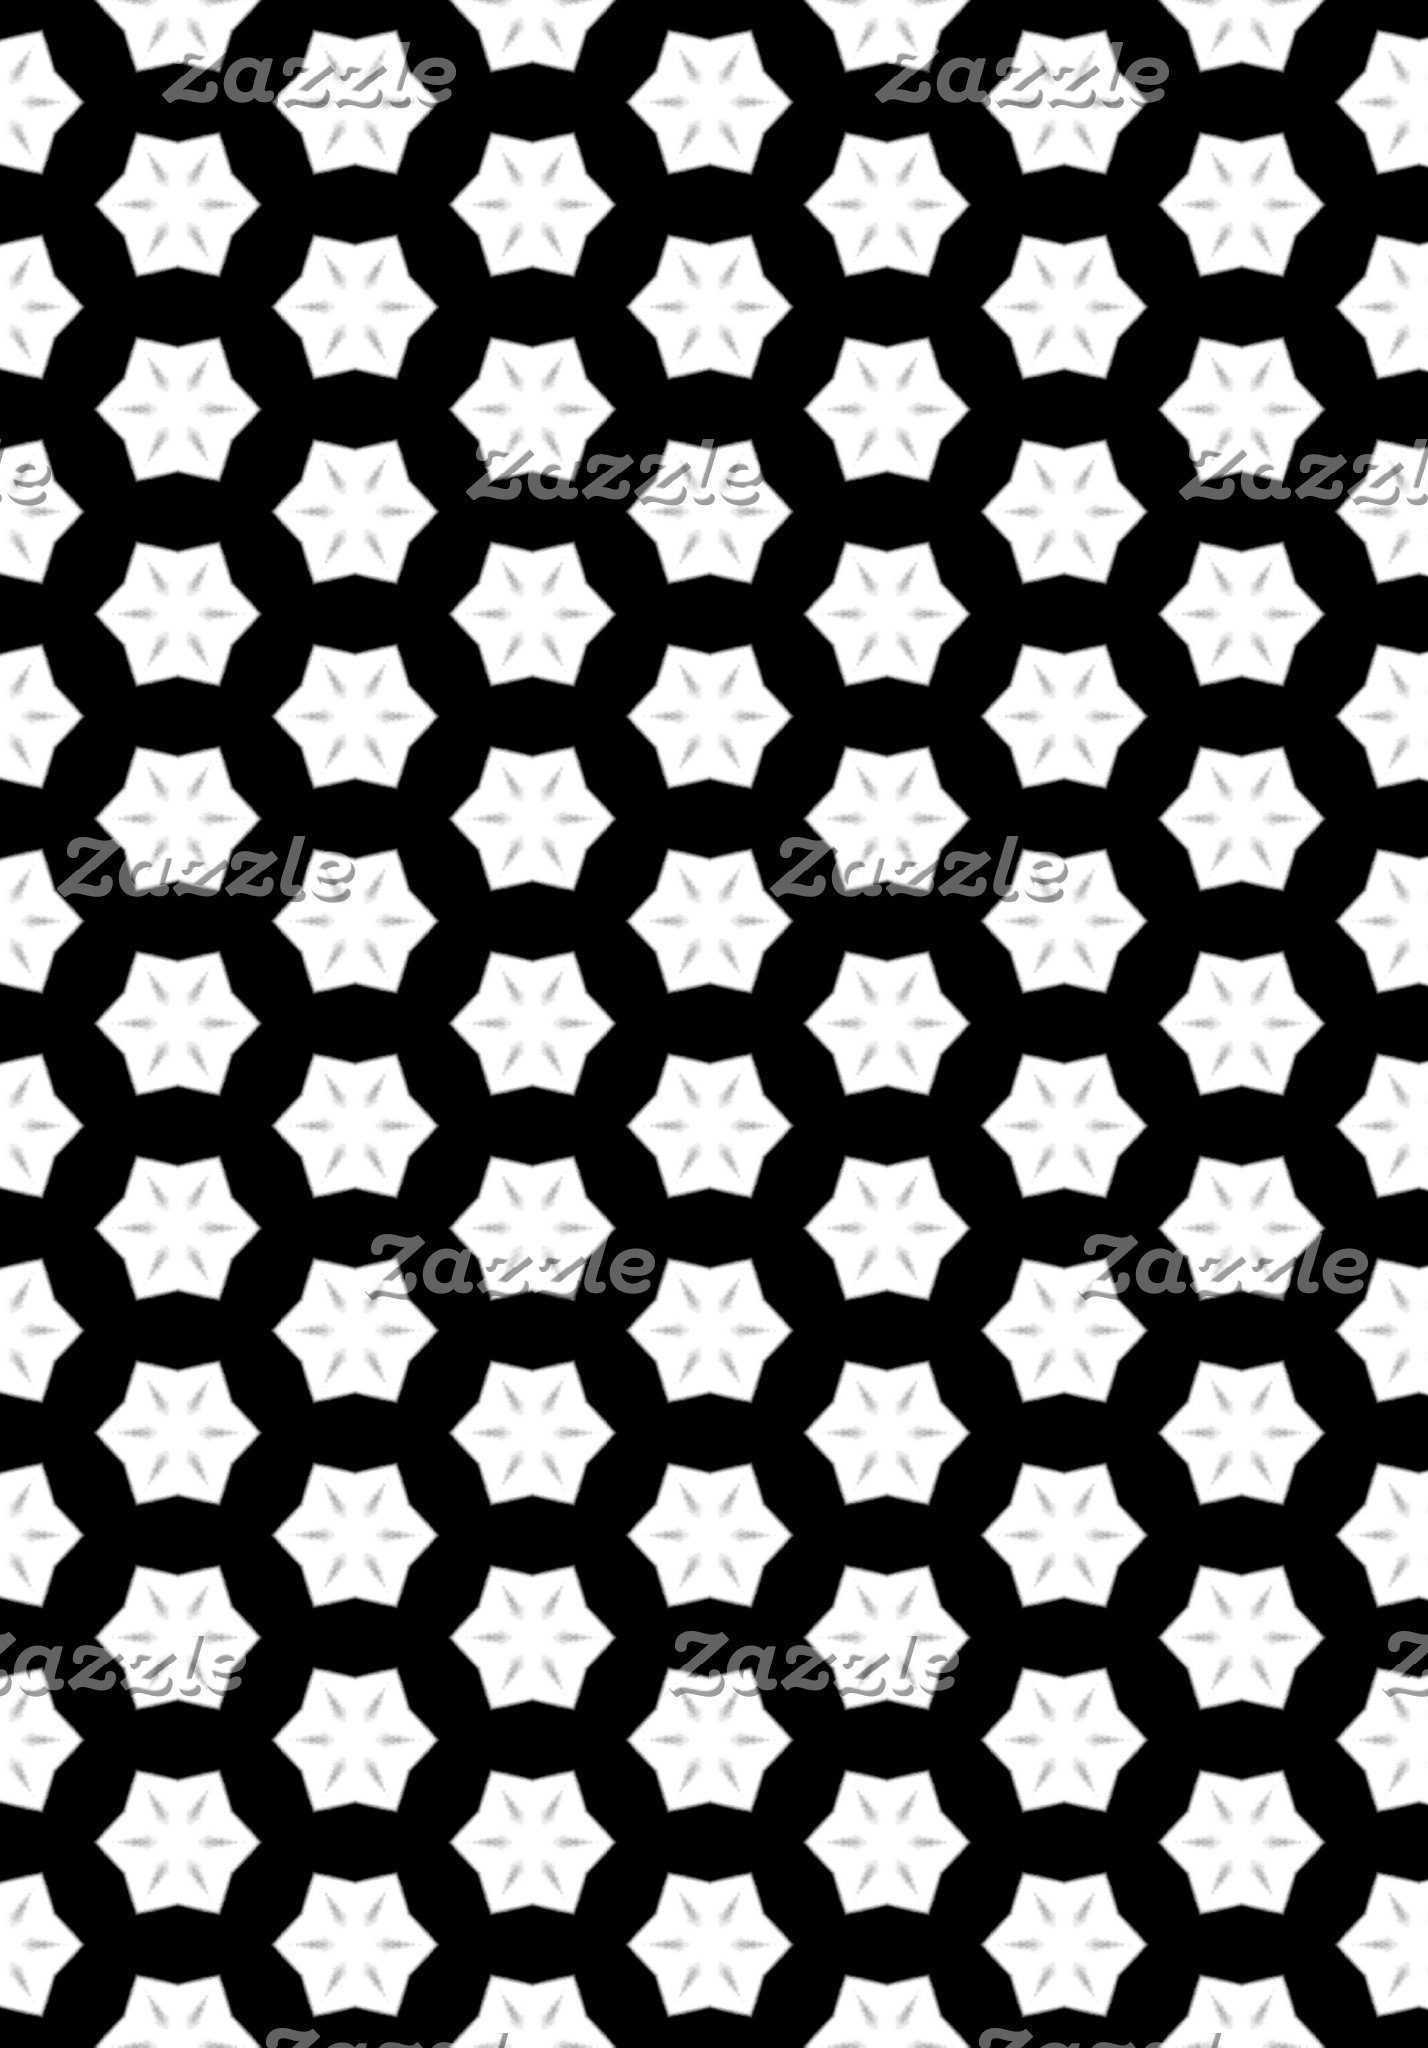 Black & White Patterns | Hexagons V